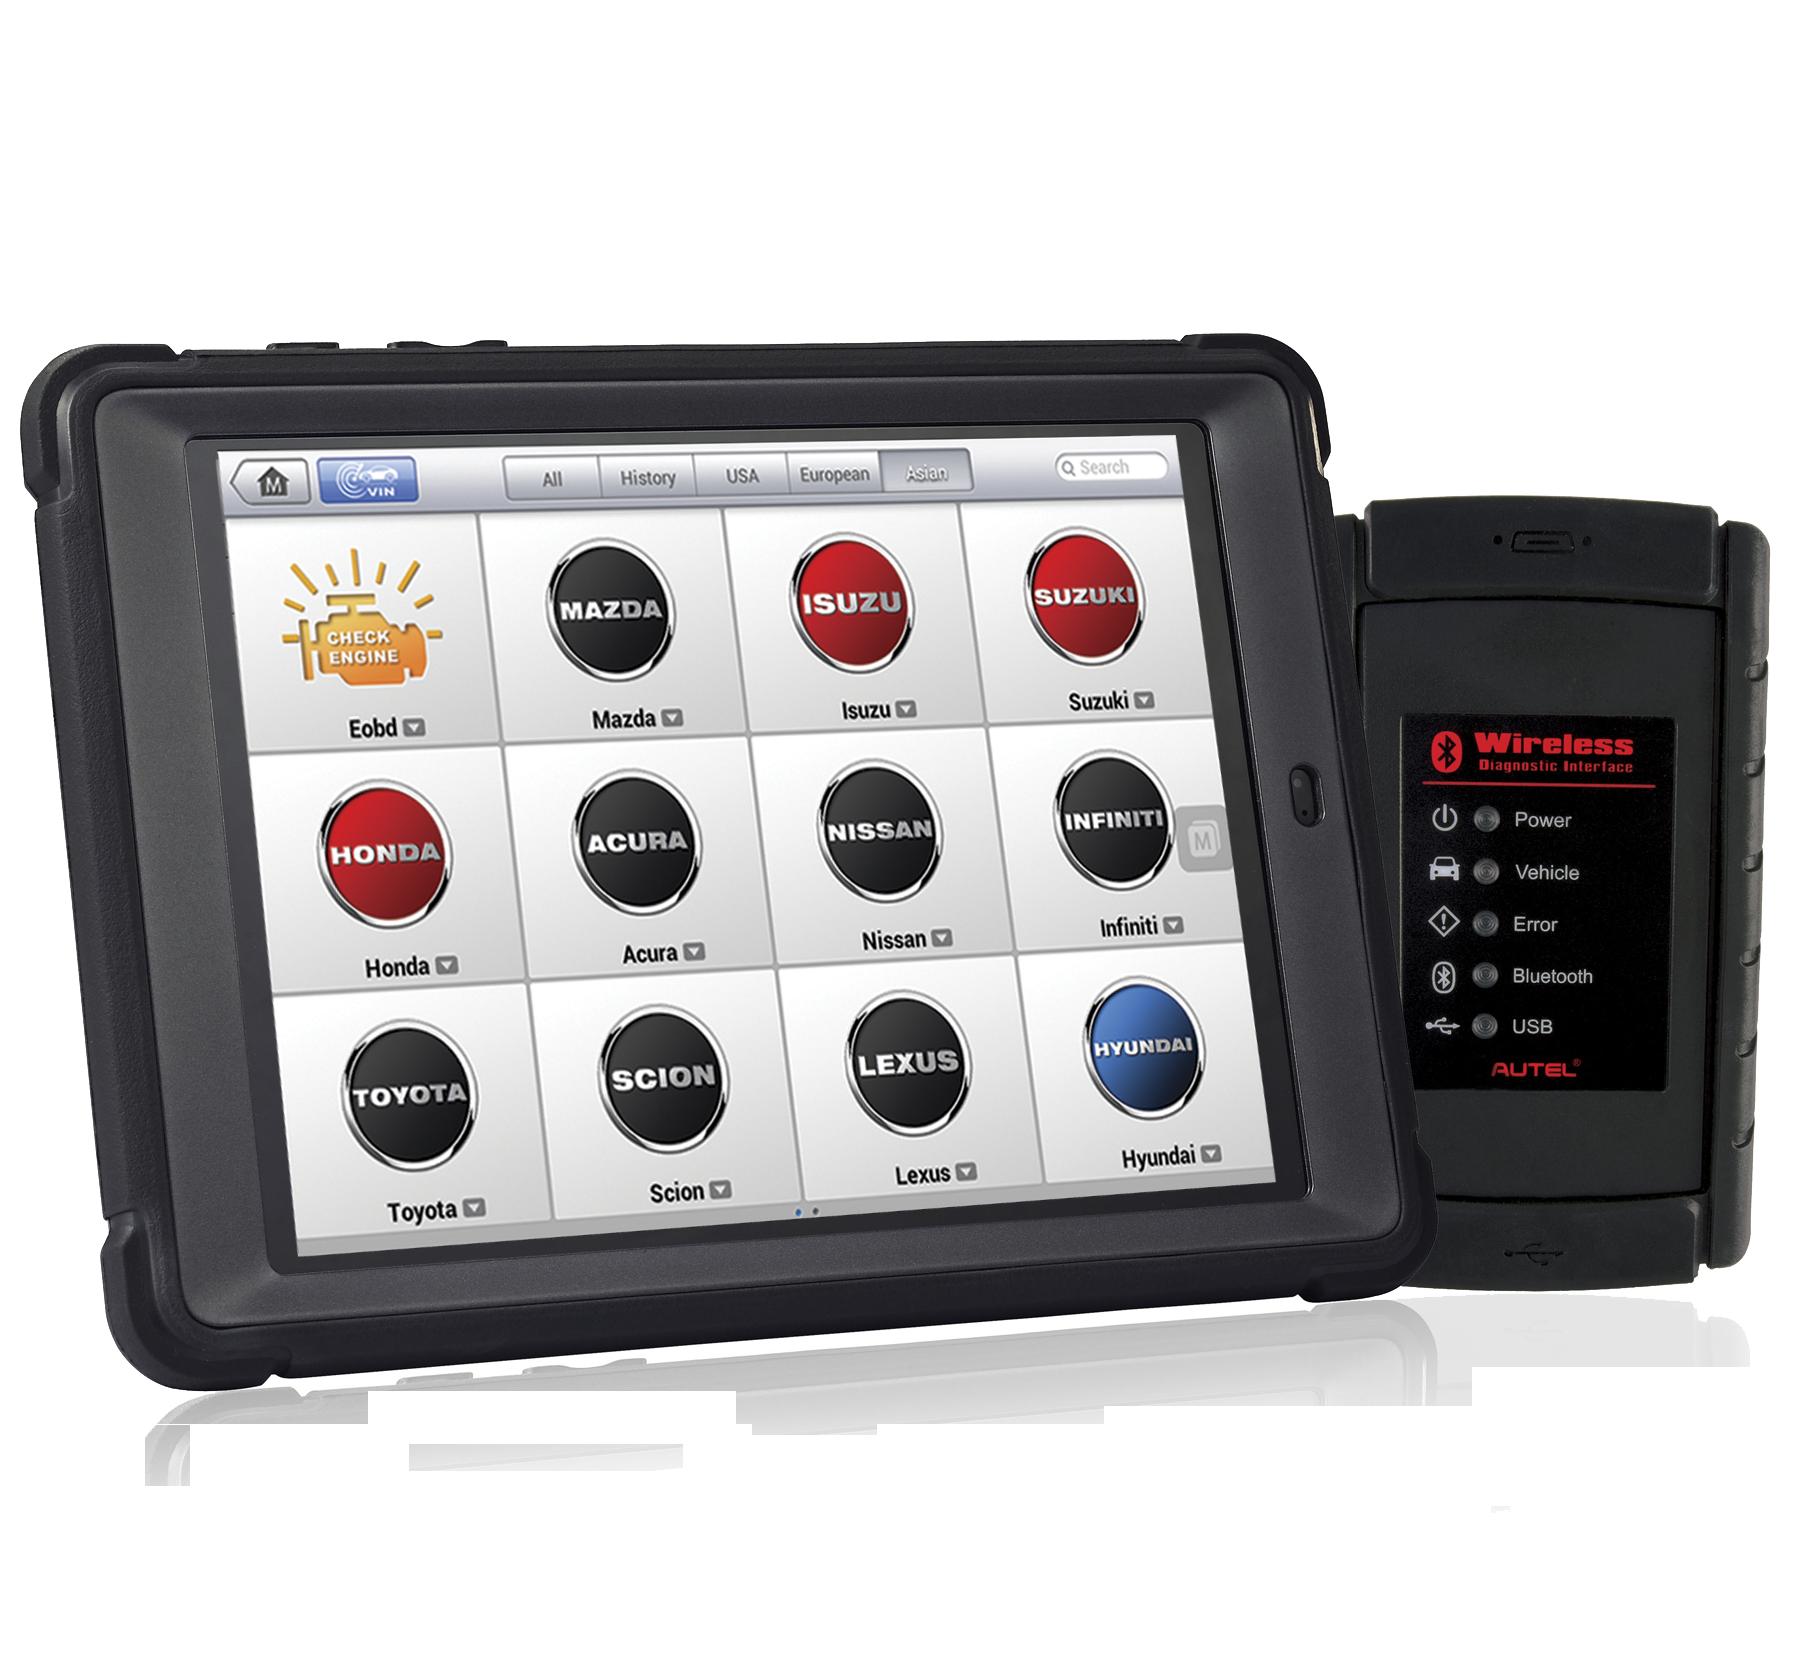 Autel MaxiSYS Mini Diagnostic Kit - AVI OnDemand